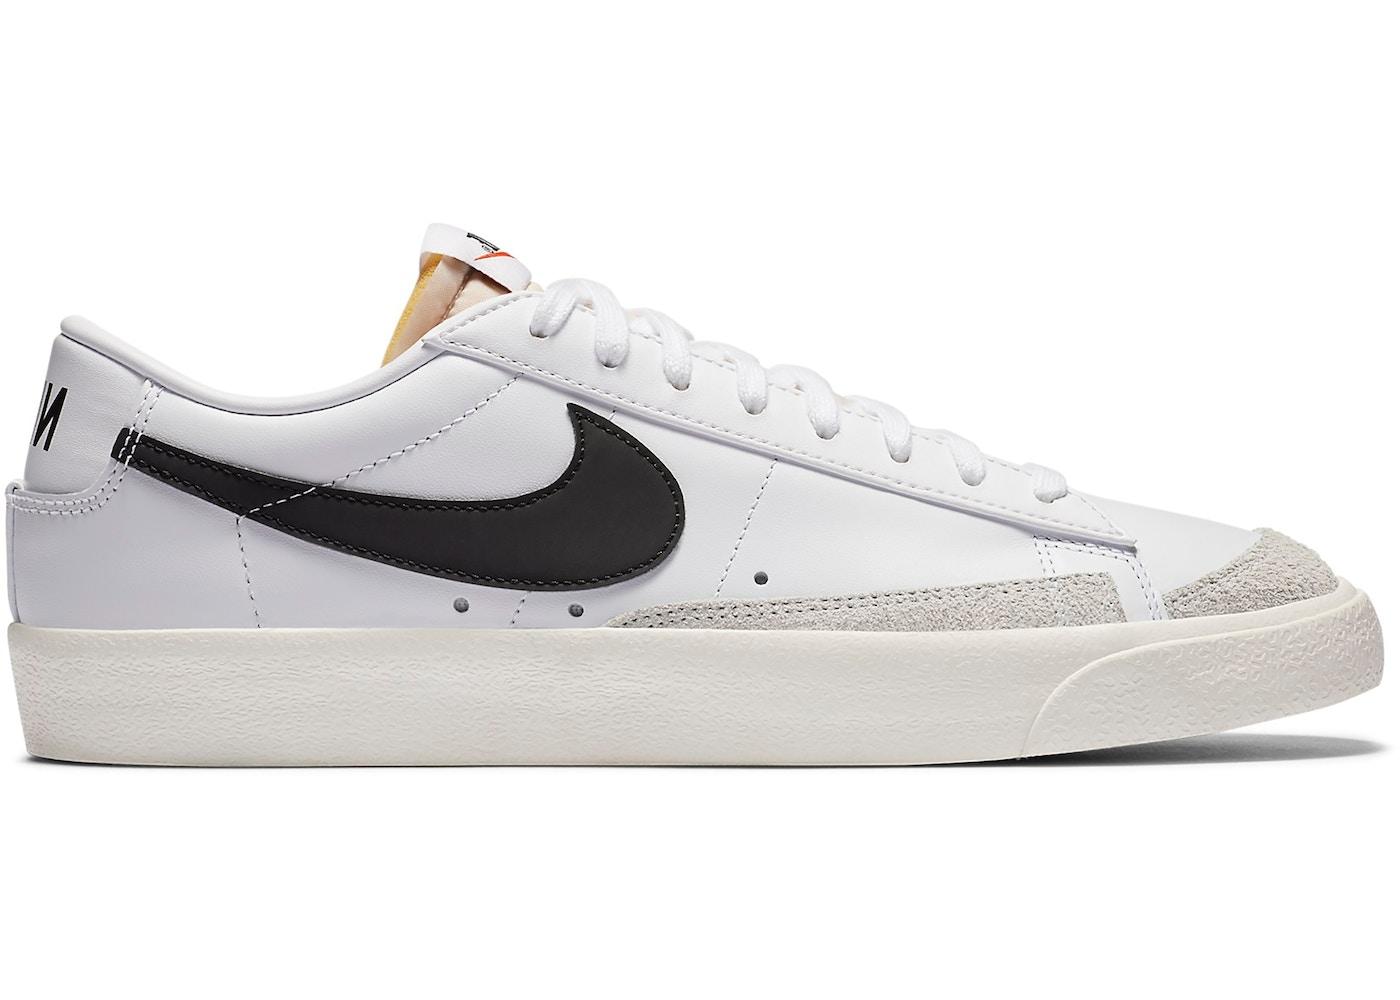 Nike Blazer Low 77 Vintage White Black